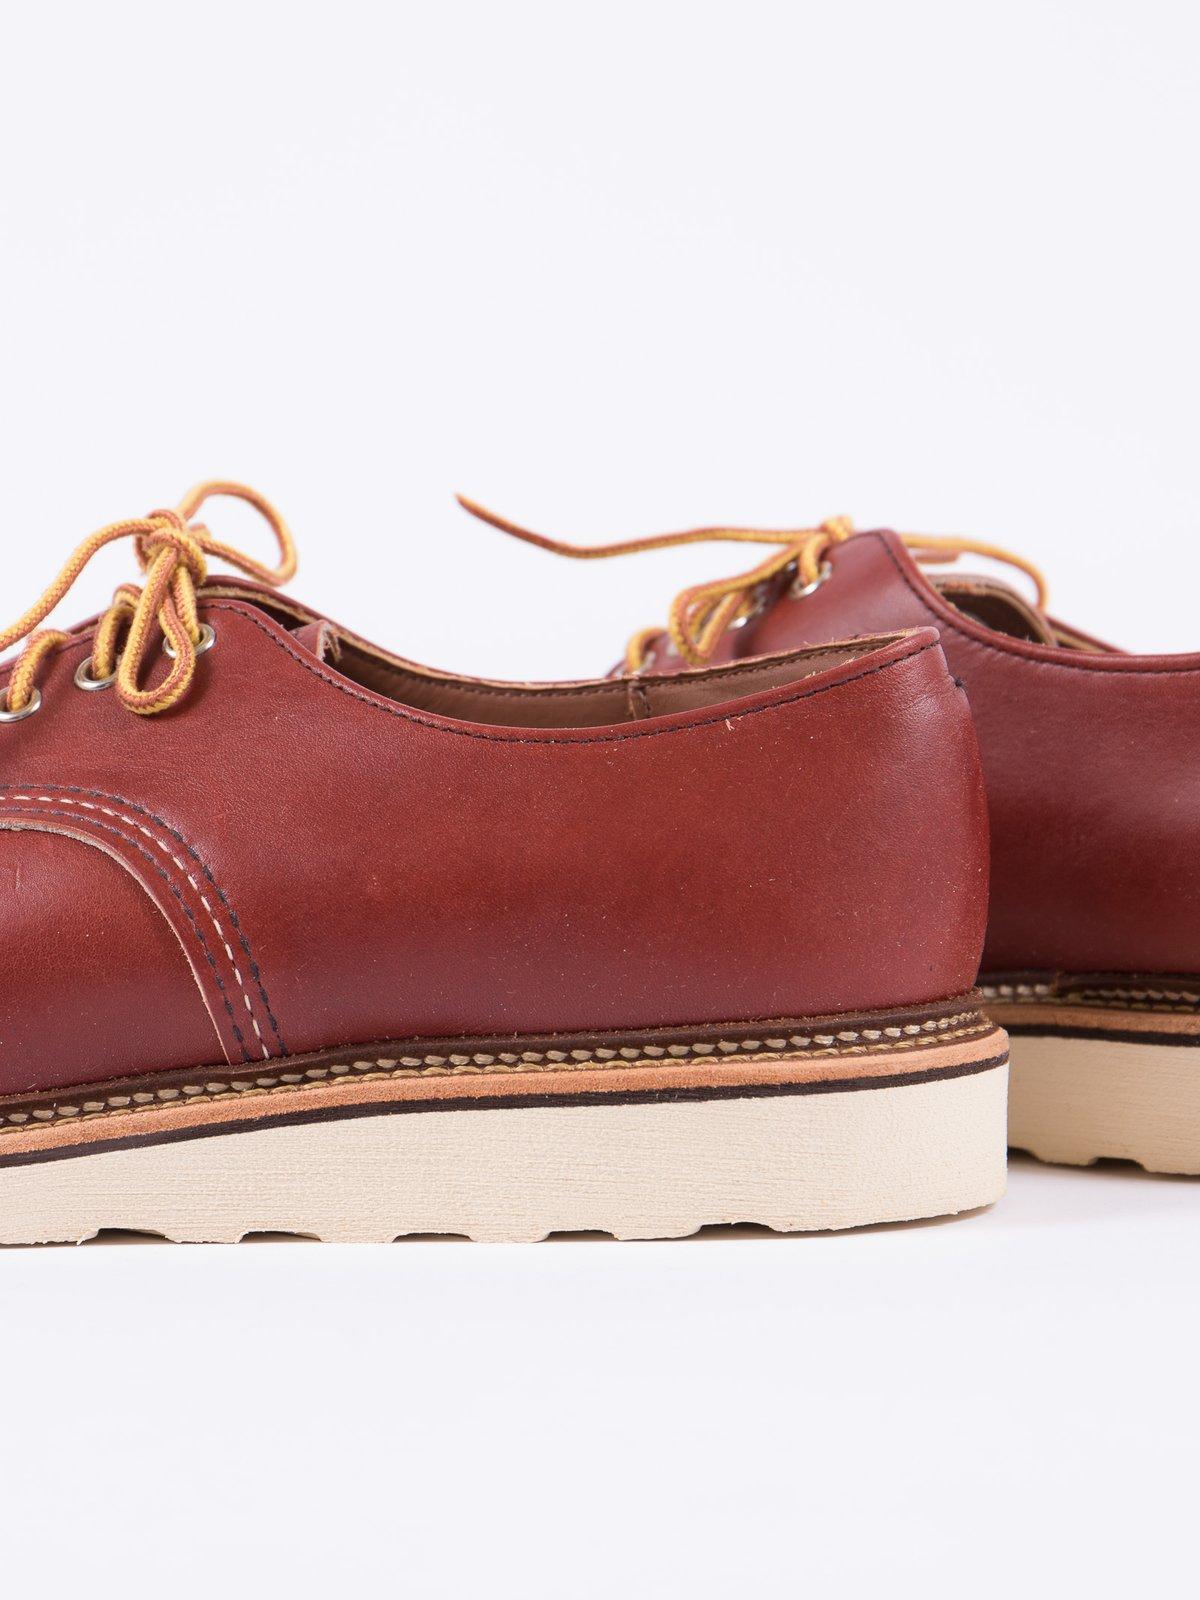 Oro Russet Portage 8103 Classic Oxford Shoe - Image 3